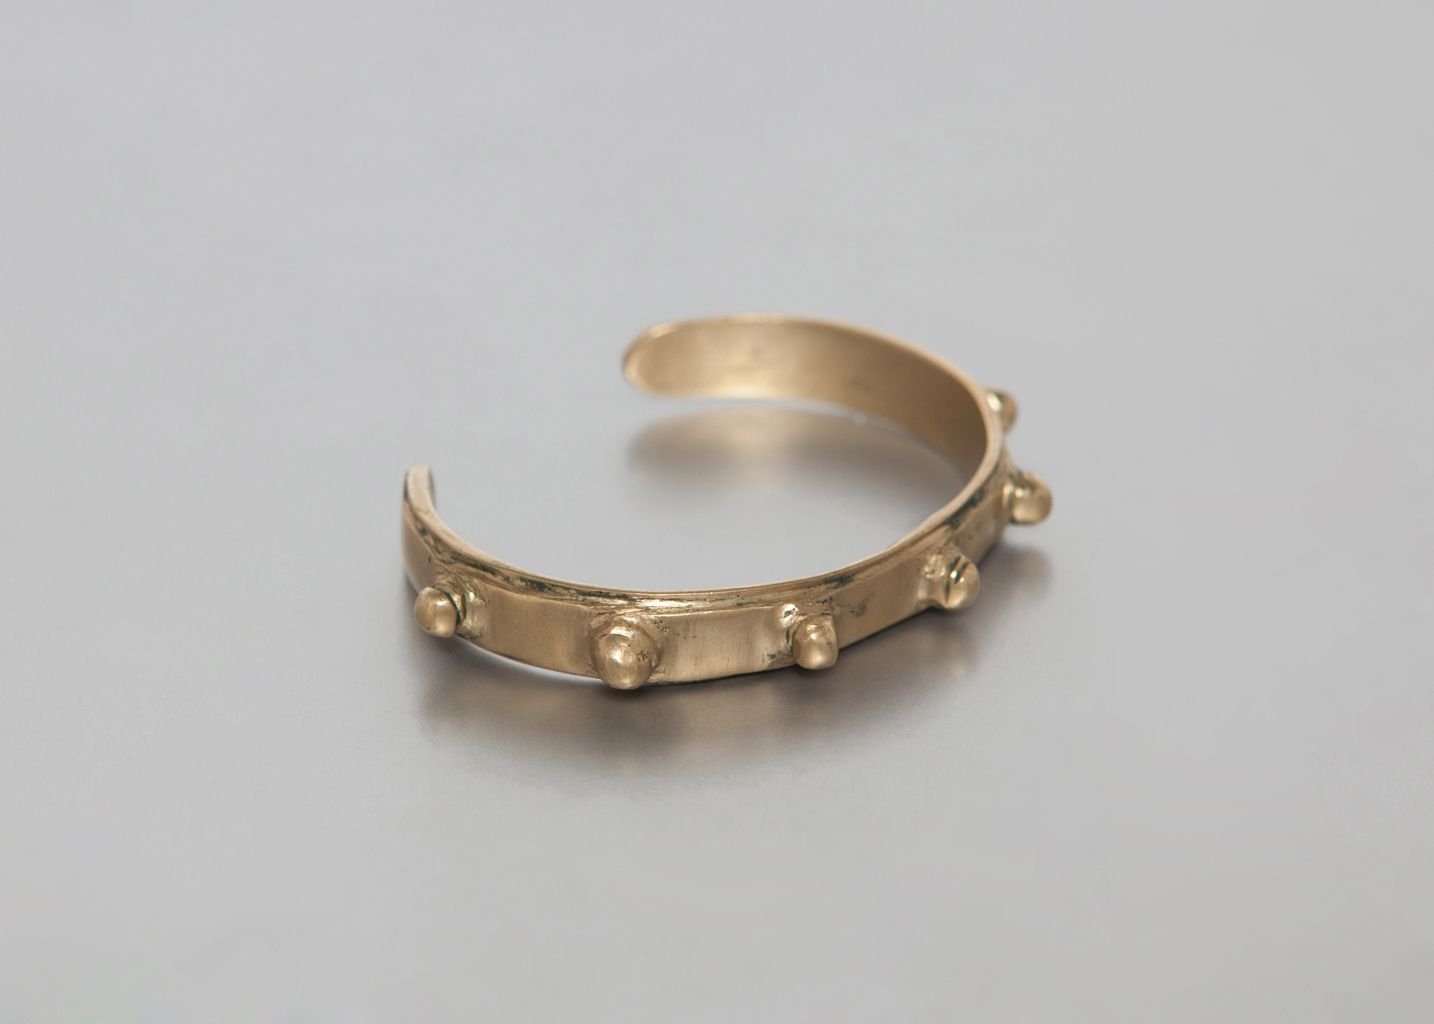 Bracelet Platon - Amanda Kaiserman